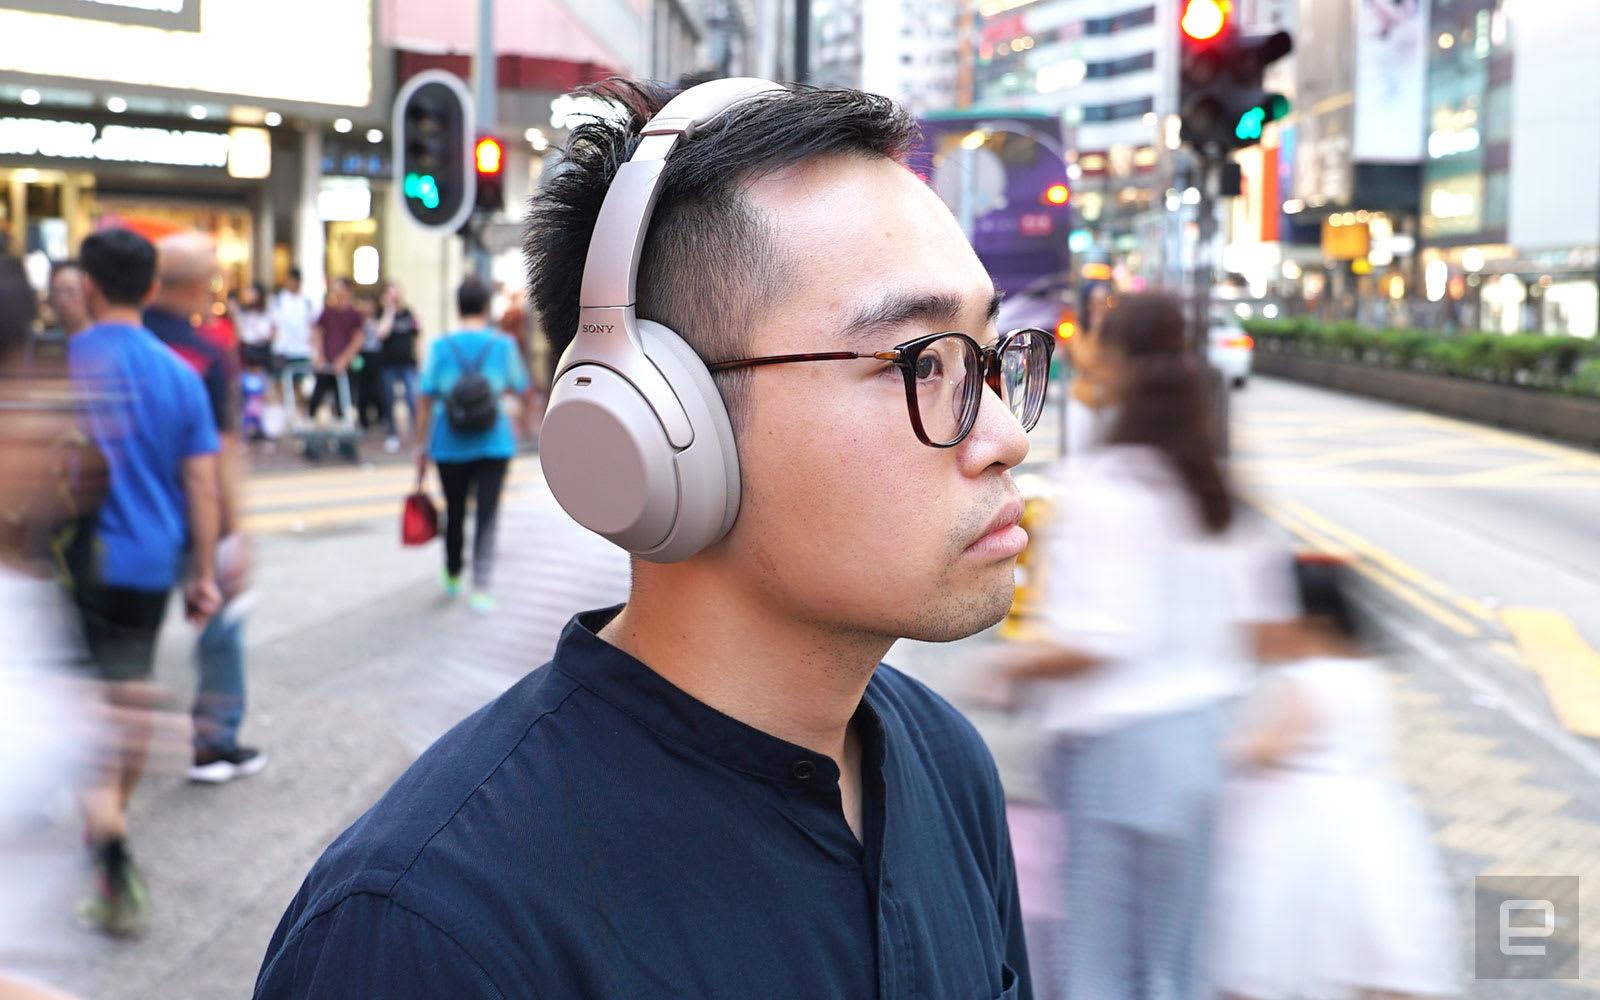 Sony WH-1000XM3 降噪無線耳機評測:讓雙耳舒適地遠離塵囂